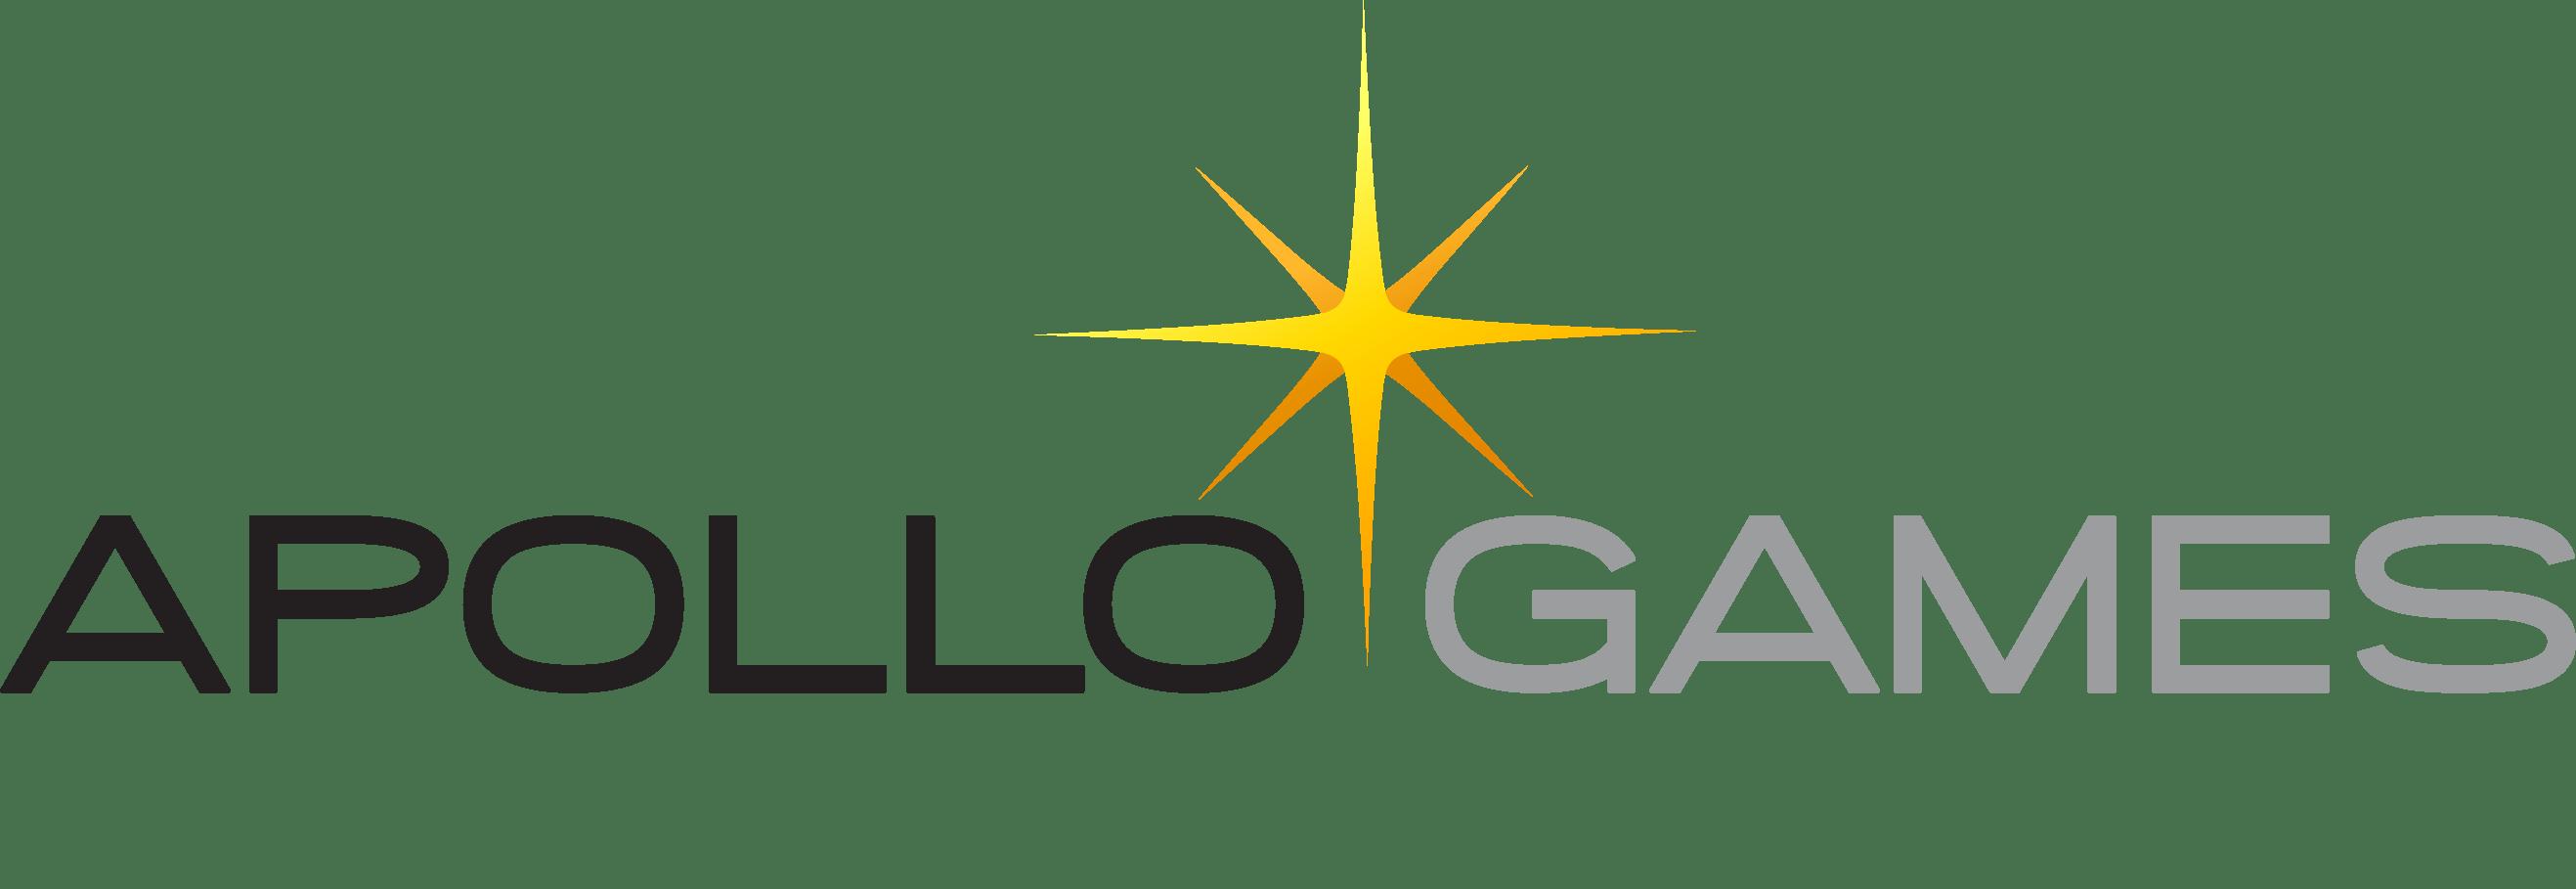 Apollo Games jeux